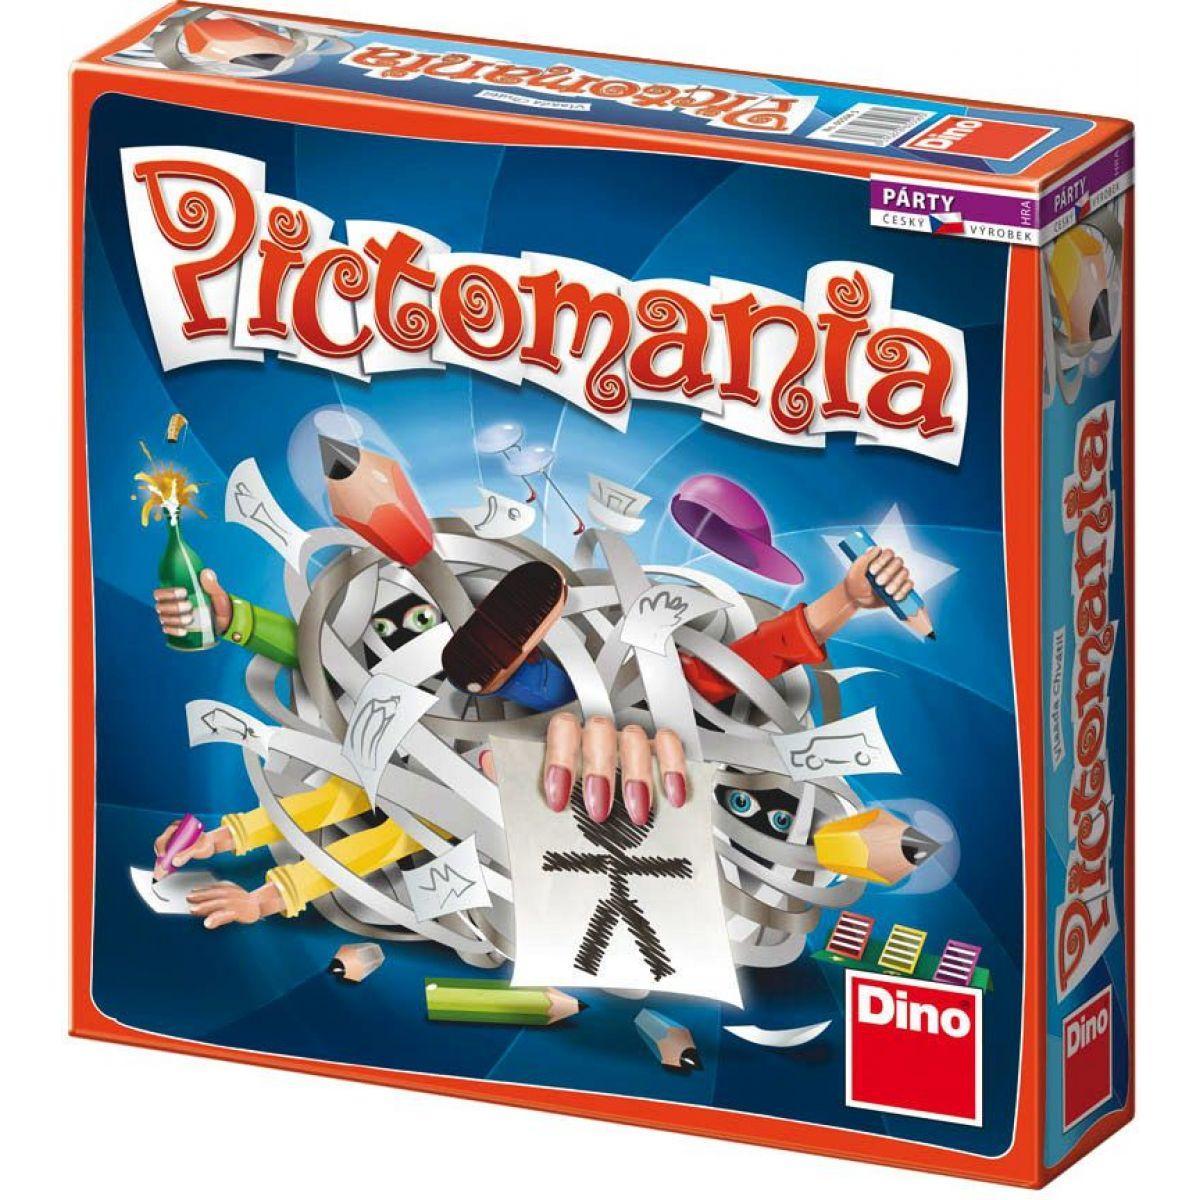 DINO 655065 - PICTOMANIA